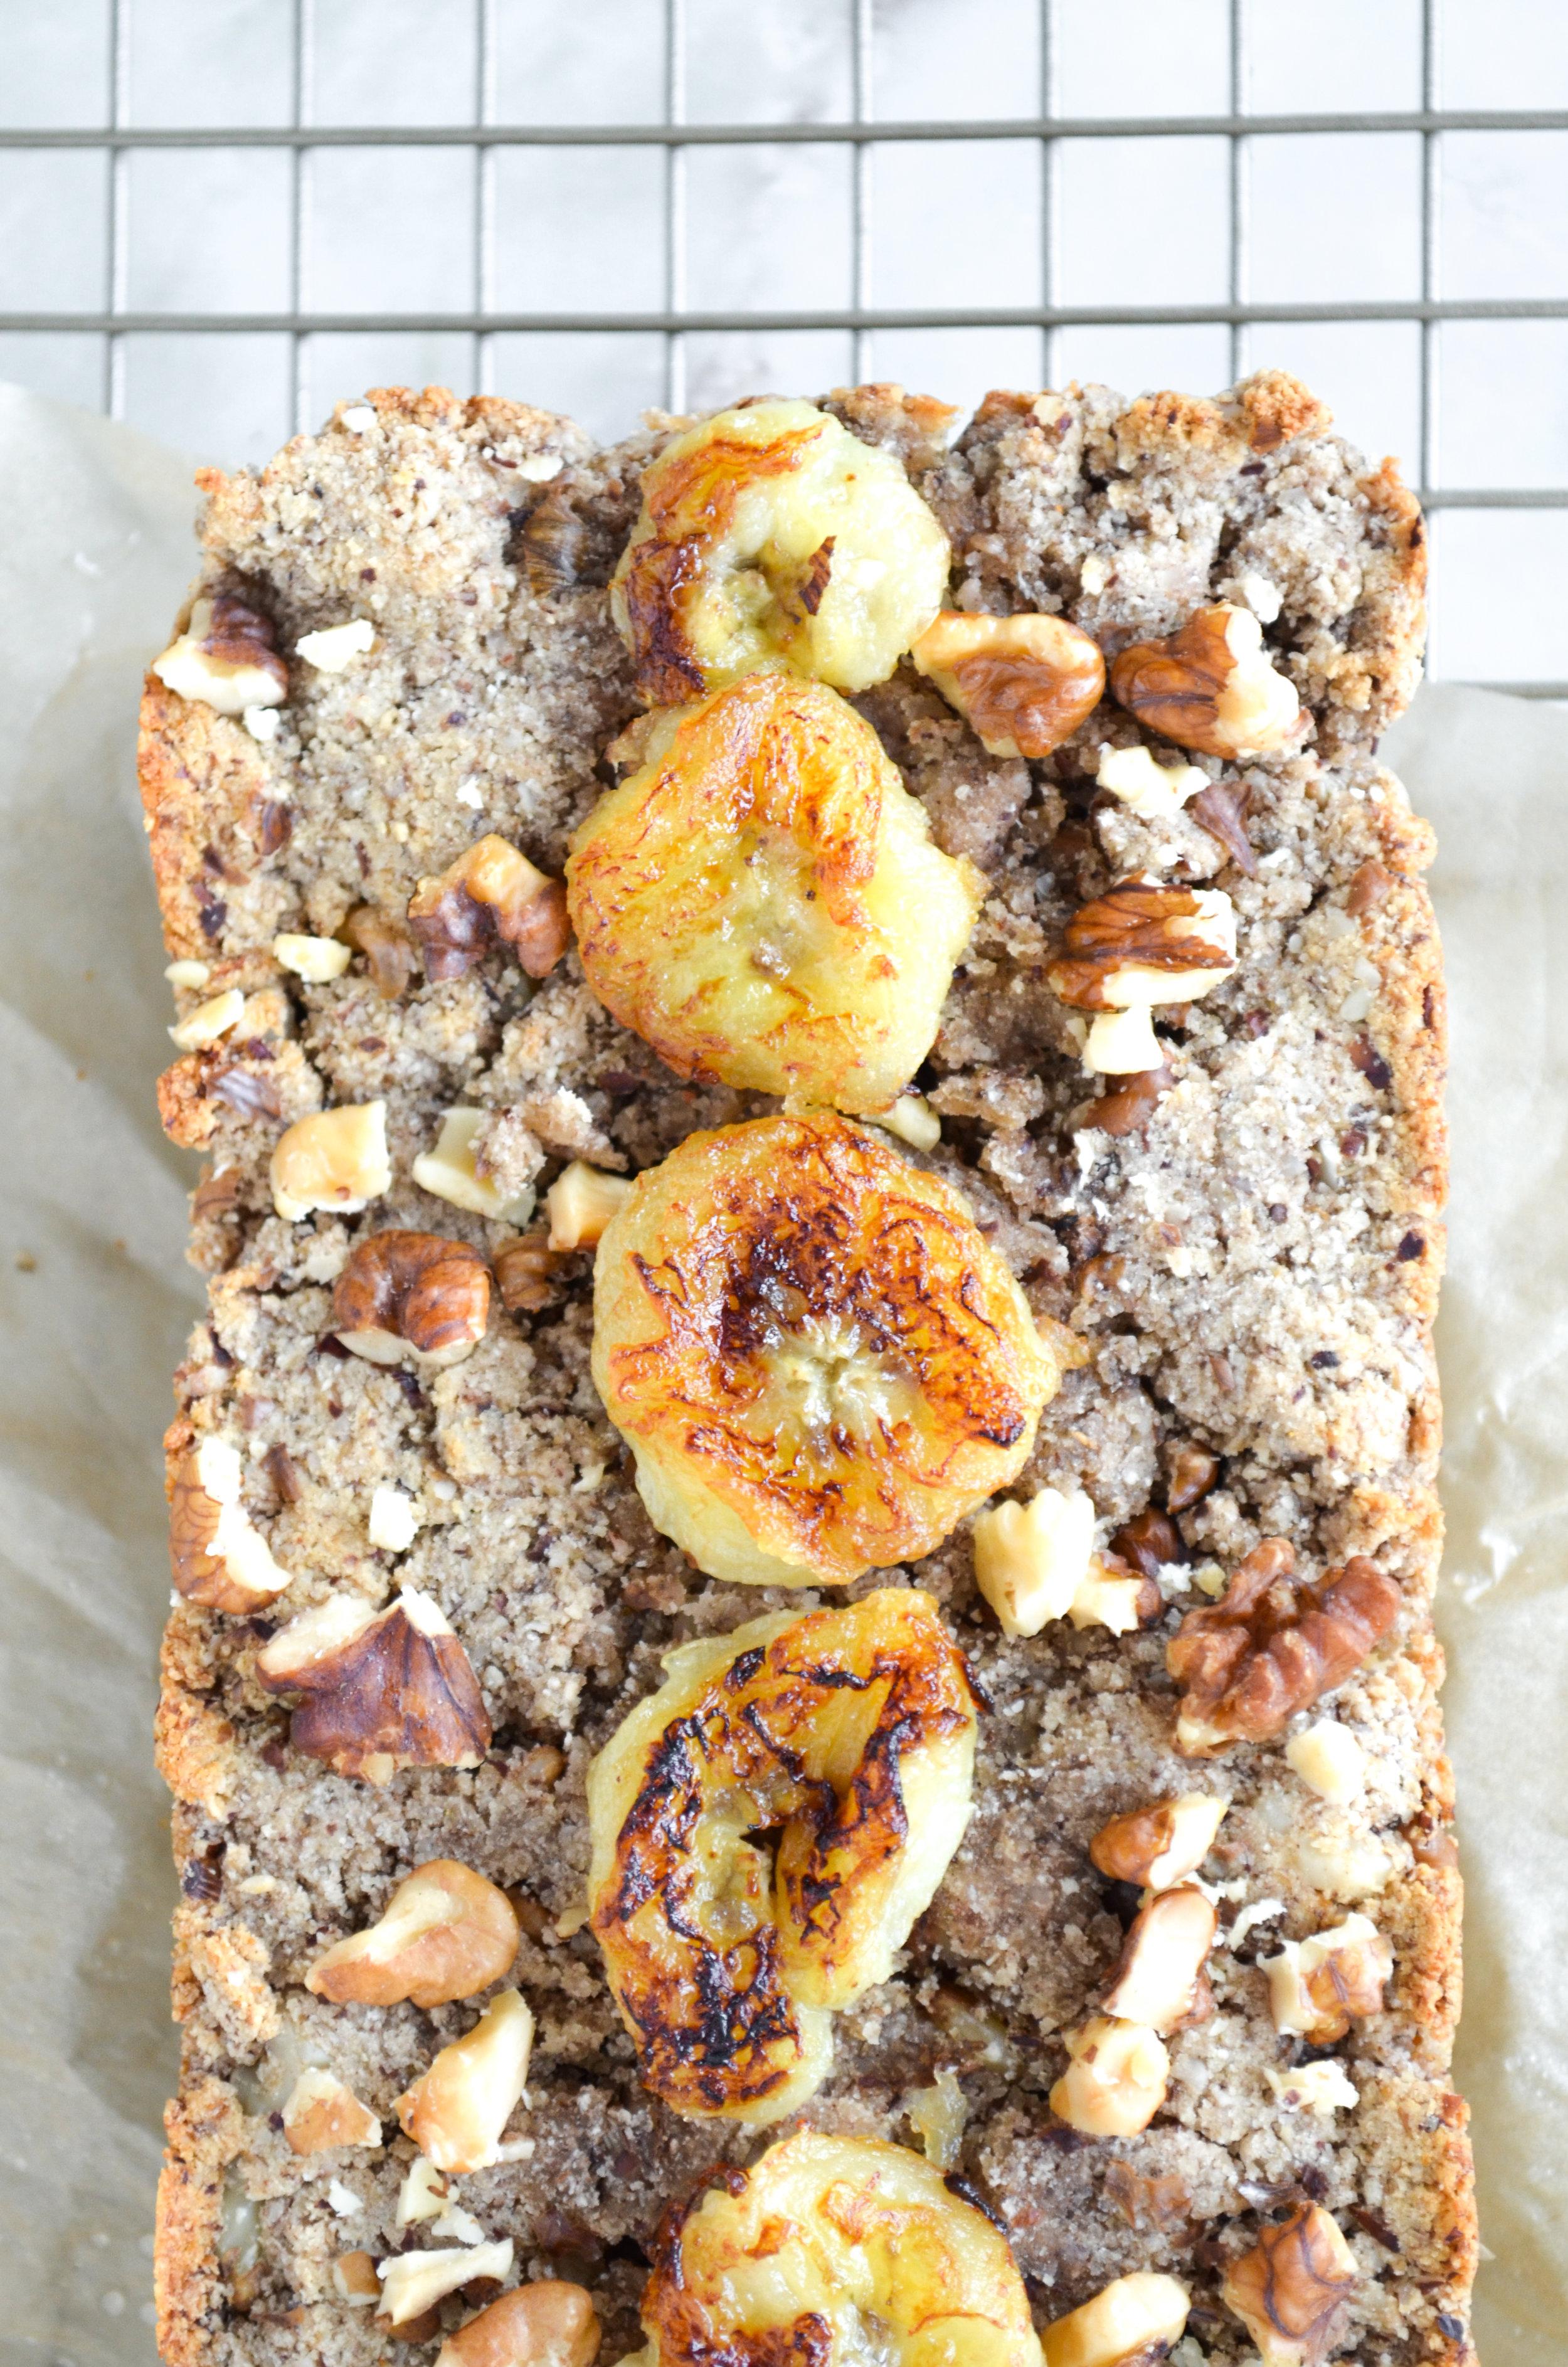 paleo banana bread // #ShiraRD #paleo #refinedsugarfree #SnacksbyShira